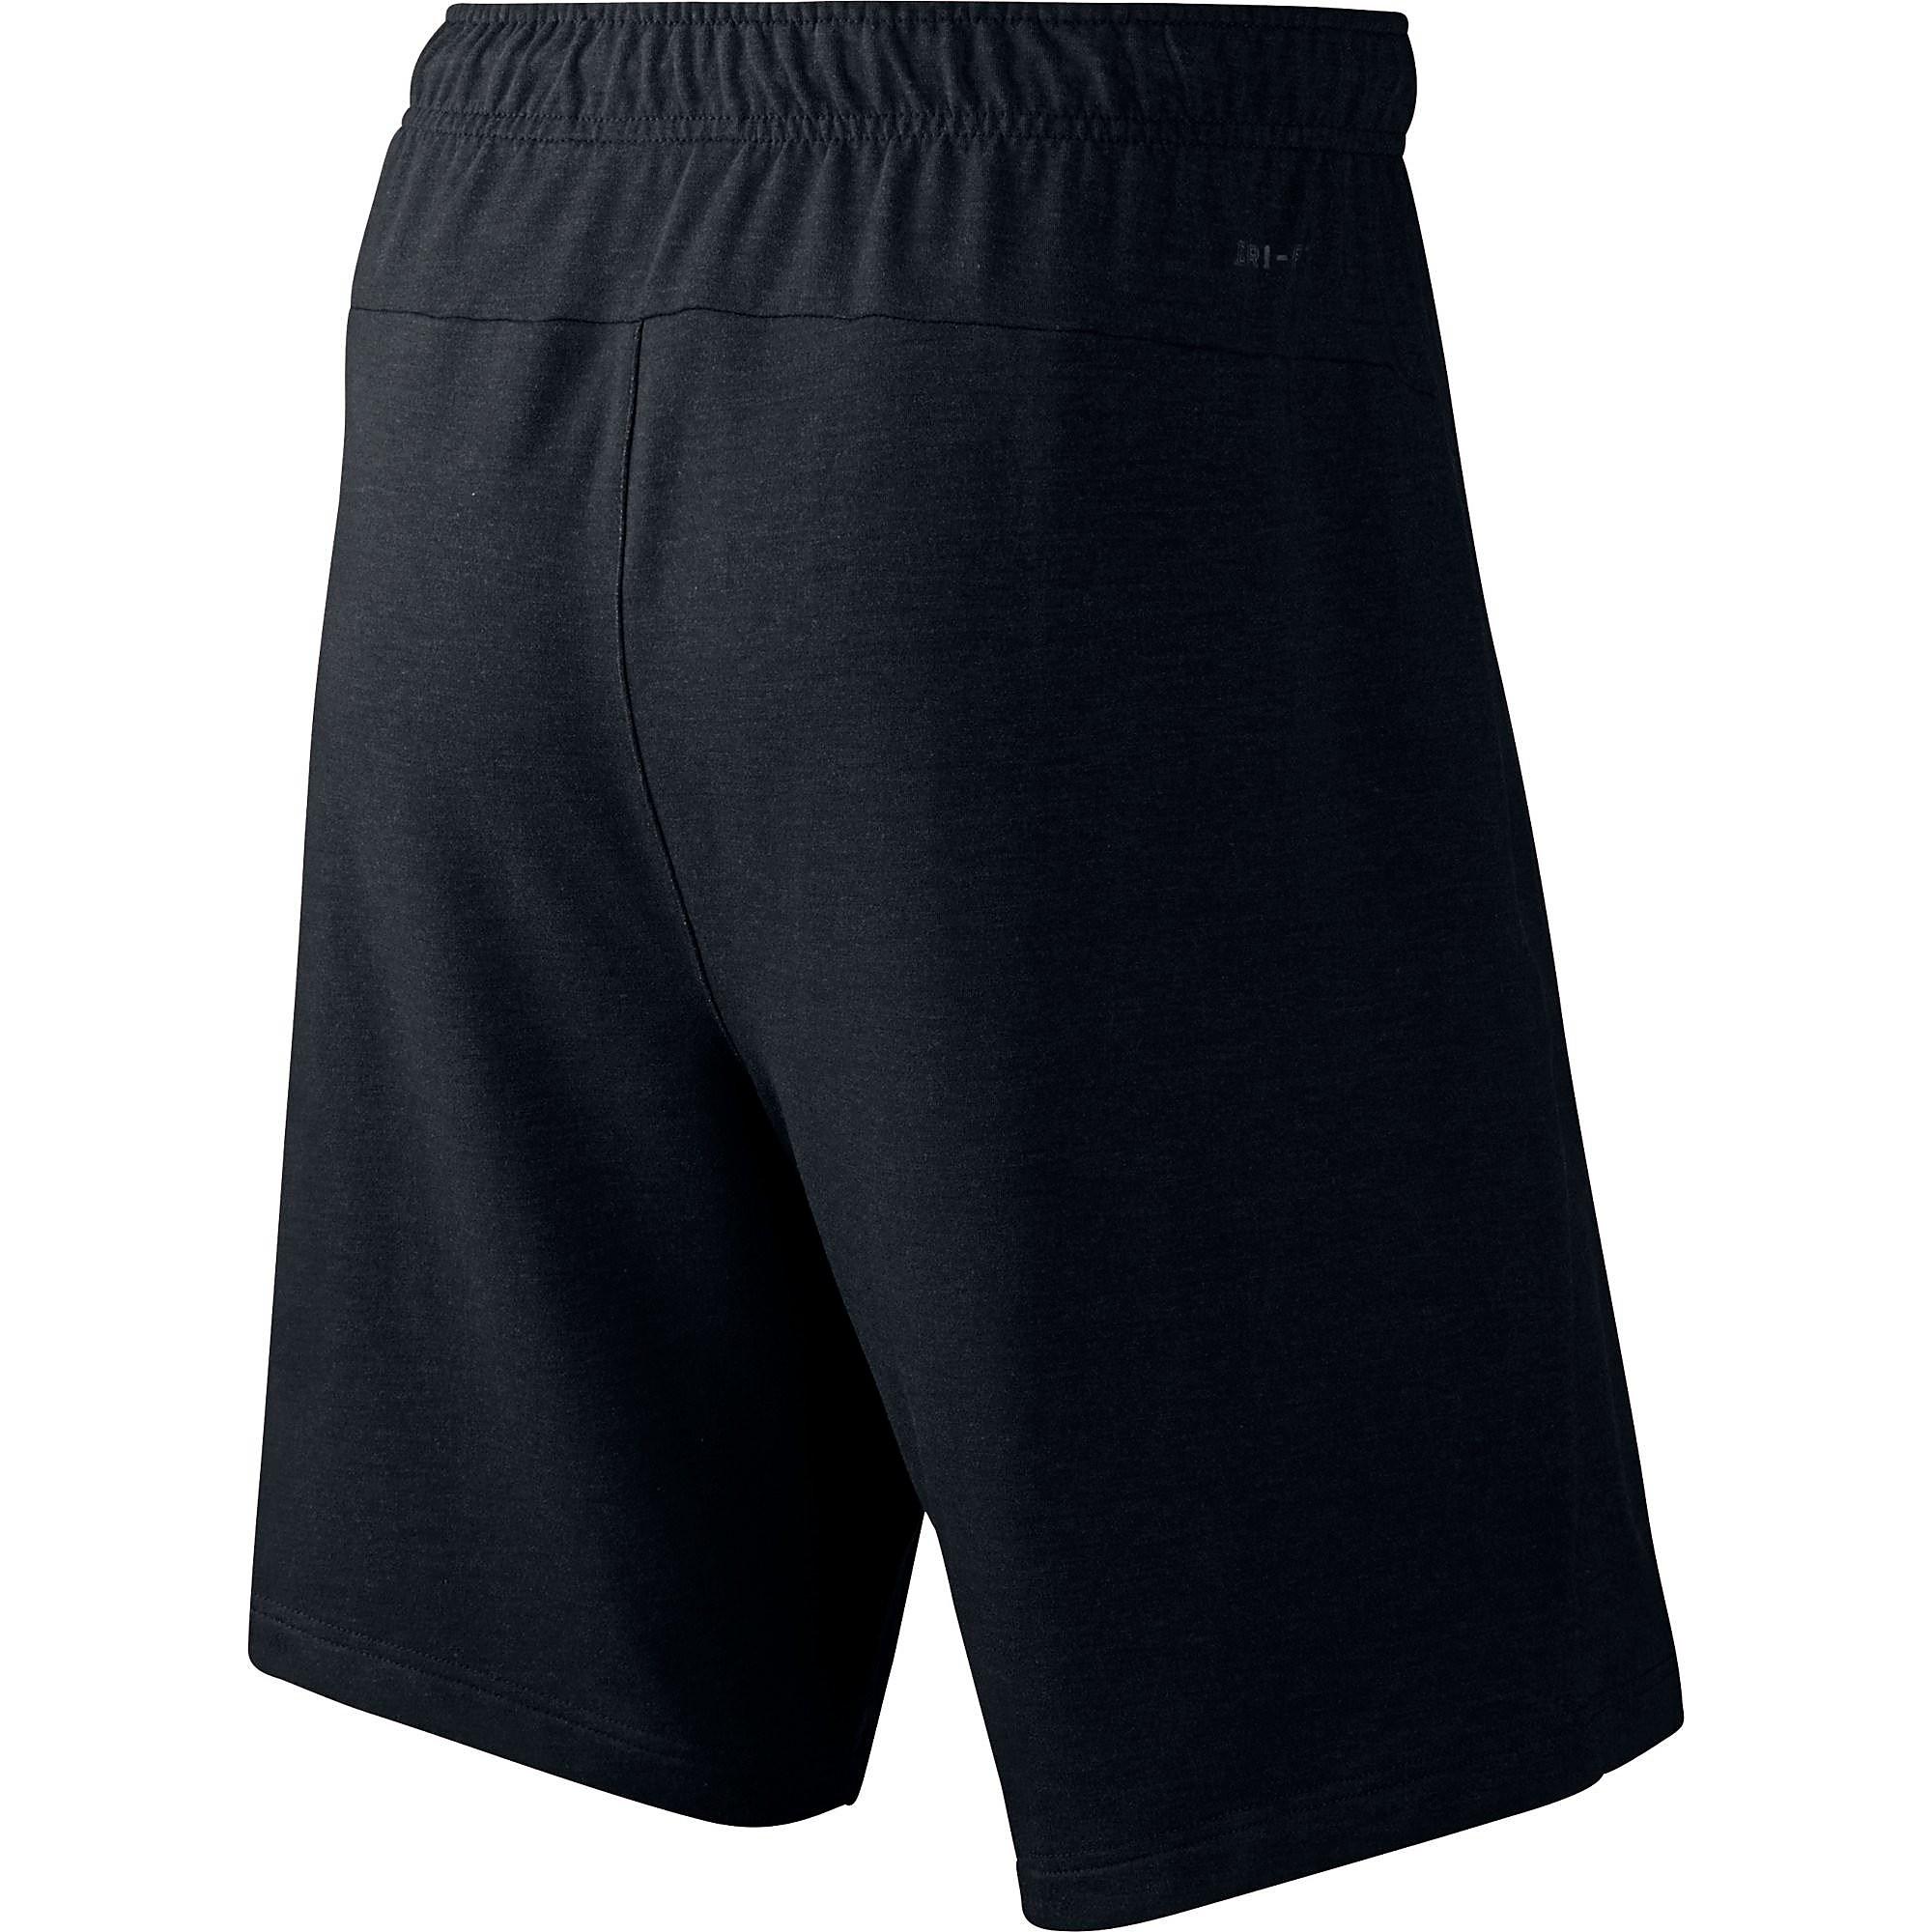 Nike Dry Training 8 Short